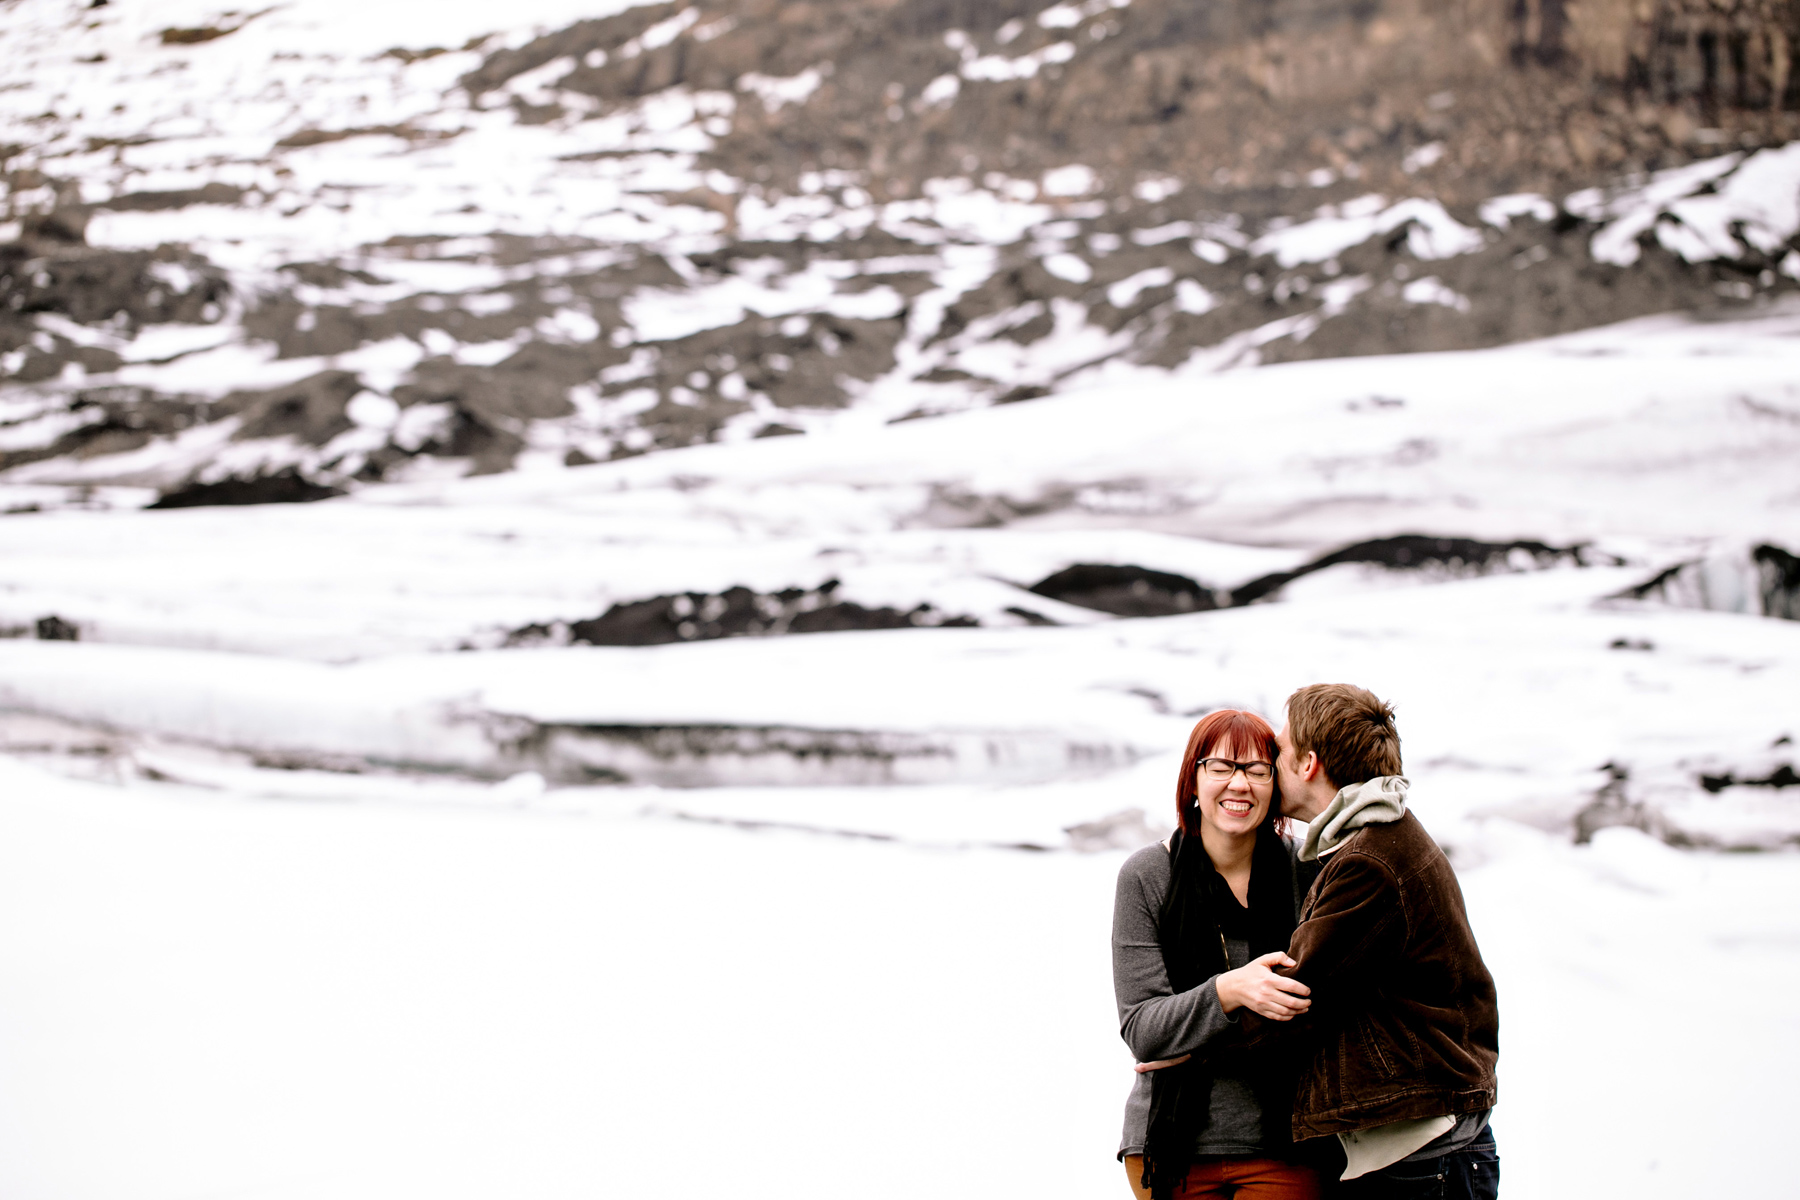 013-epic-iceland-photographer-portraits-kandisebrown-2016